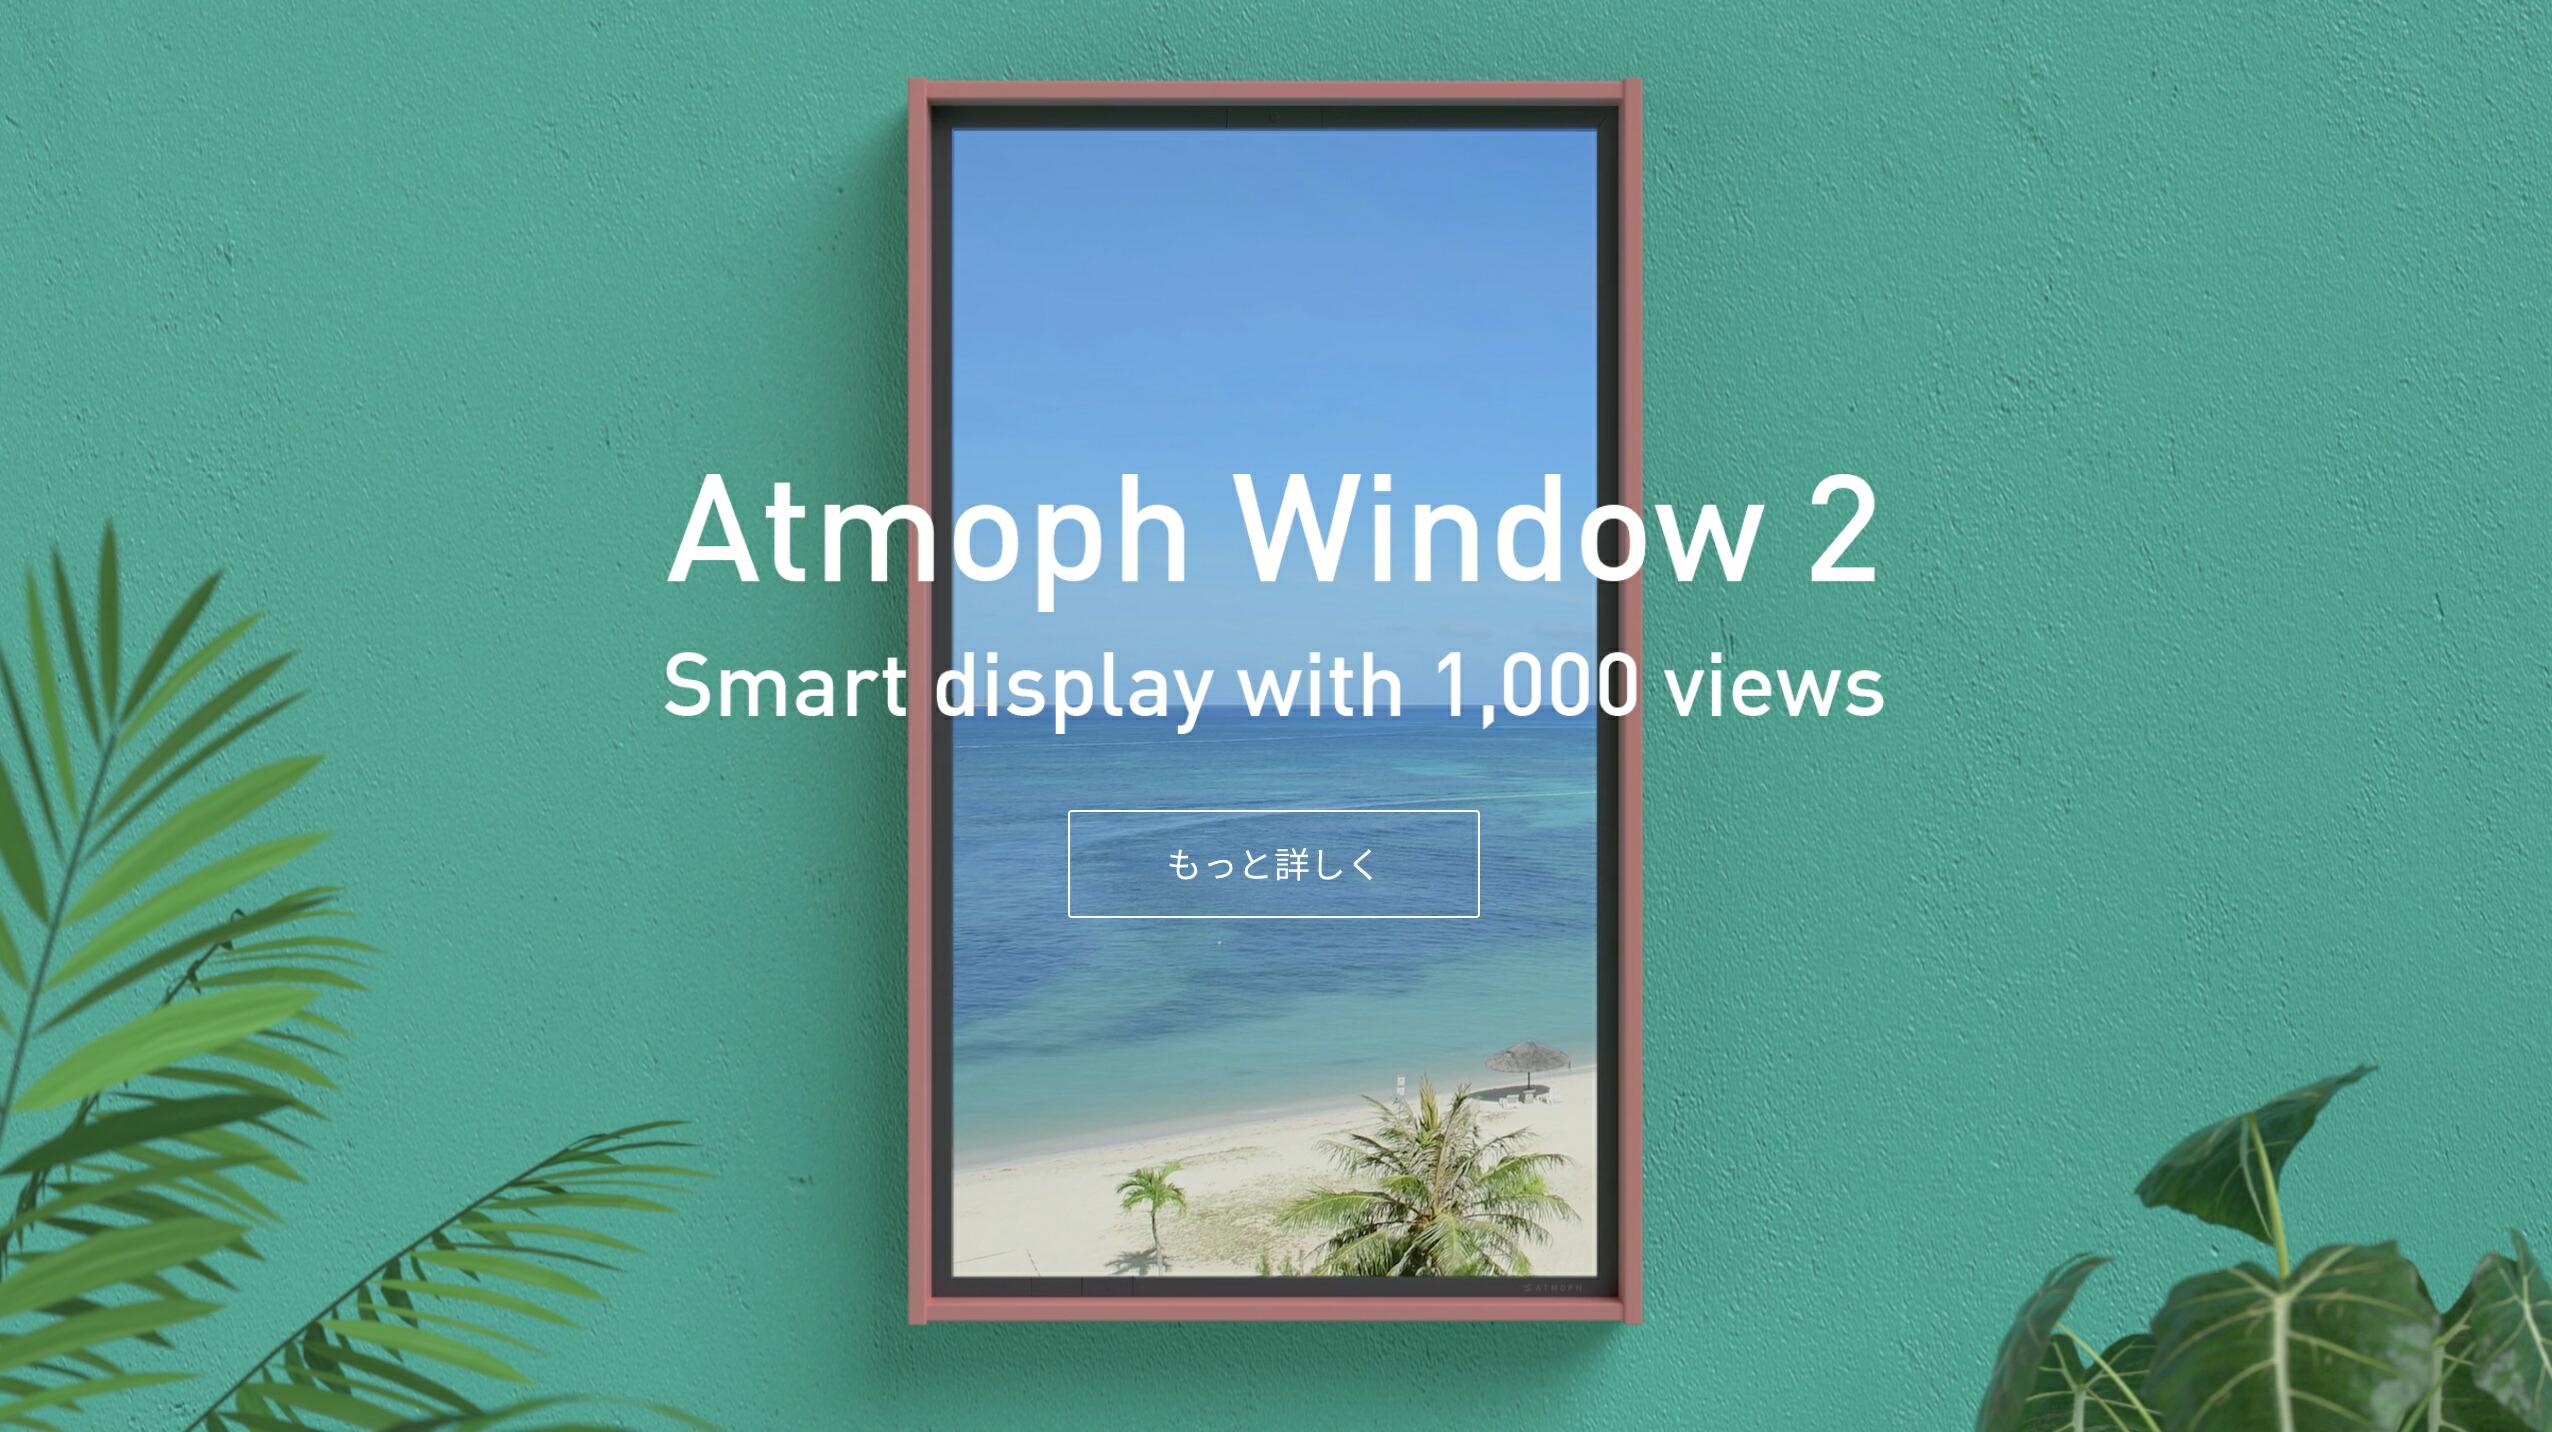 Atmoph Window 2 Smart display with 1000 views